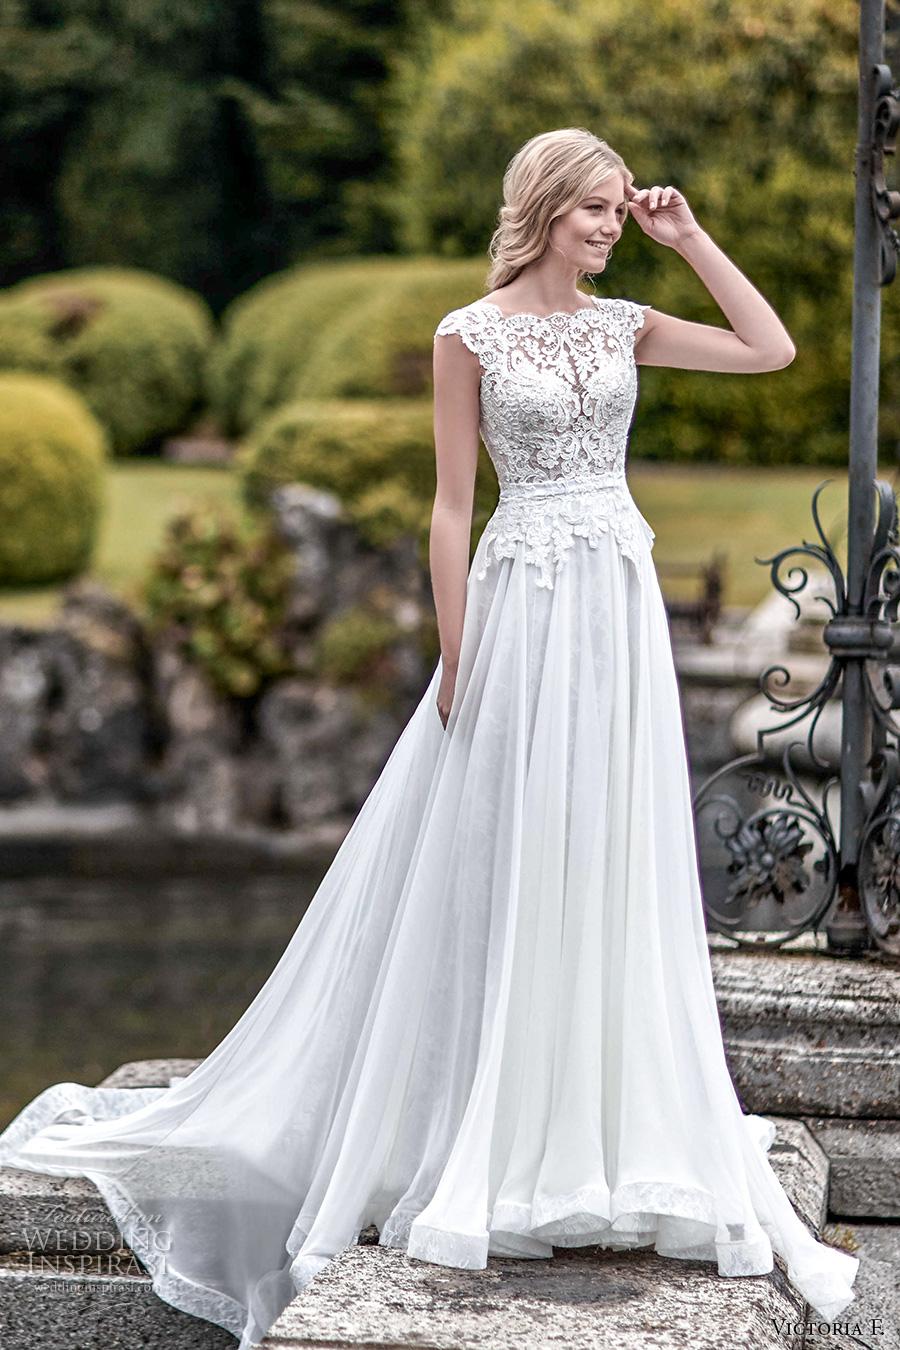 Elegant Wedding Dresses 2017 : Maison signore wedding dresses inspirasi